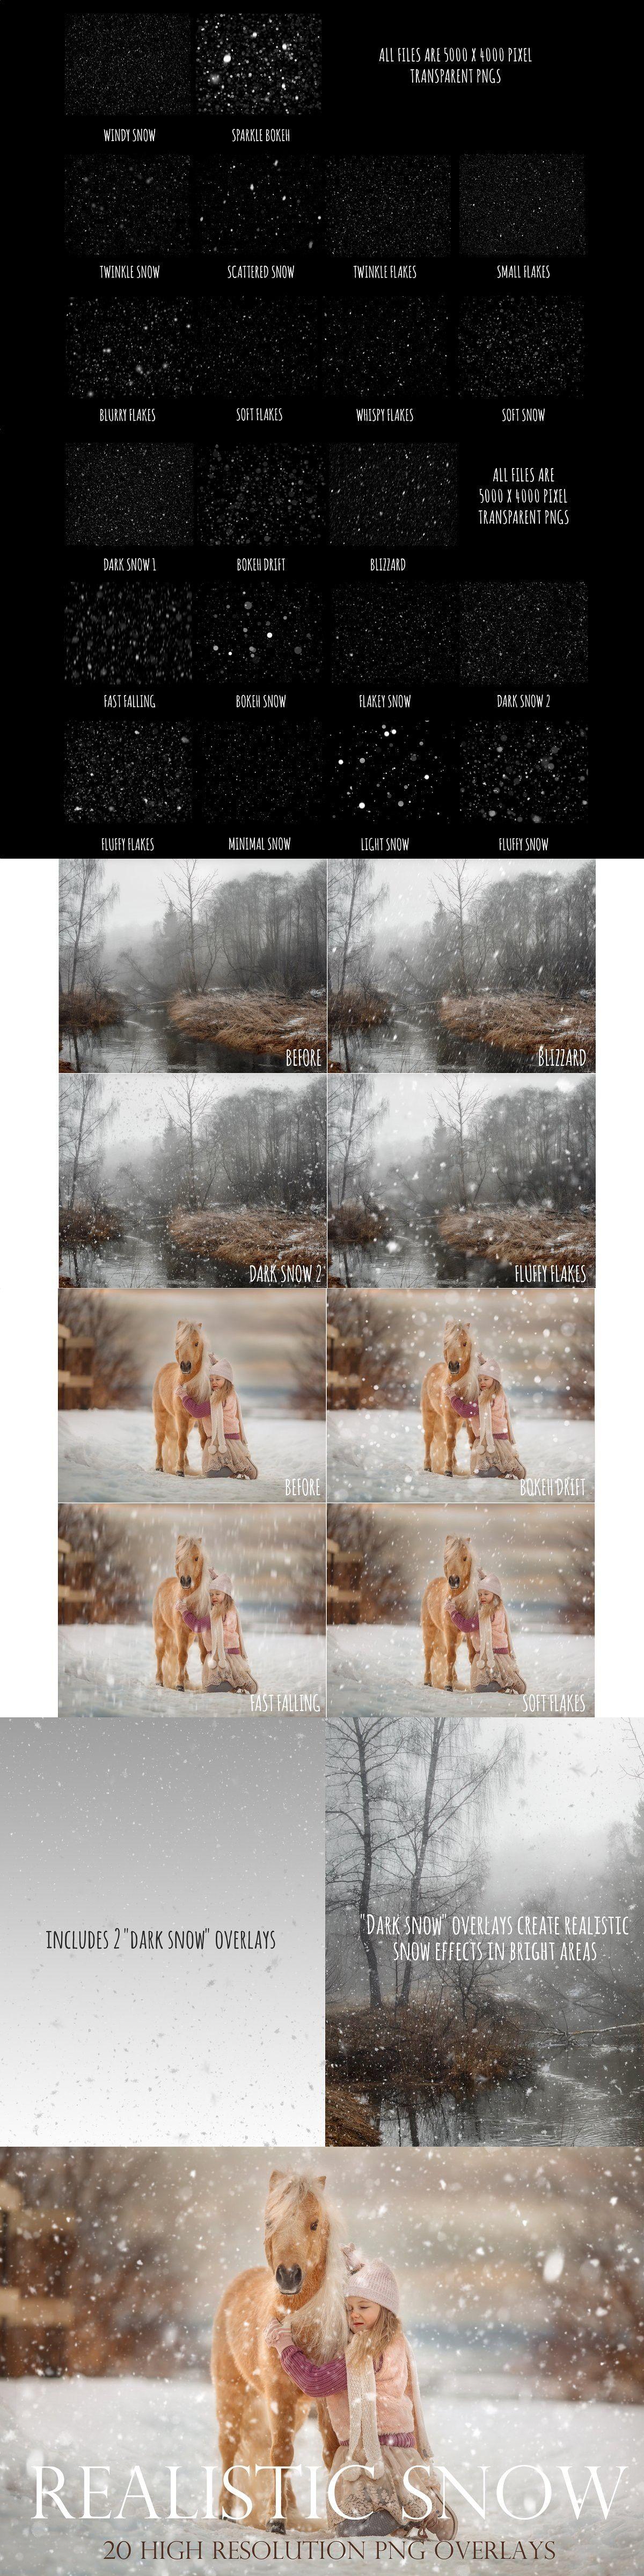 Realistic Snow Overlays Snow Overlay Overlays Photoshop Instruction